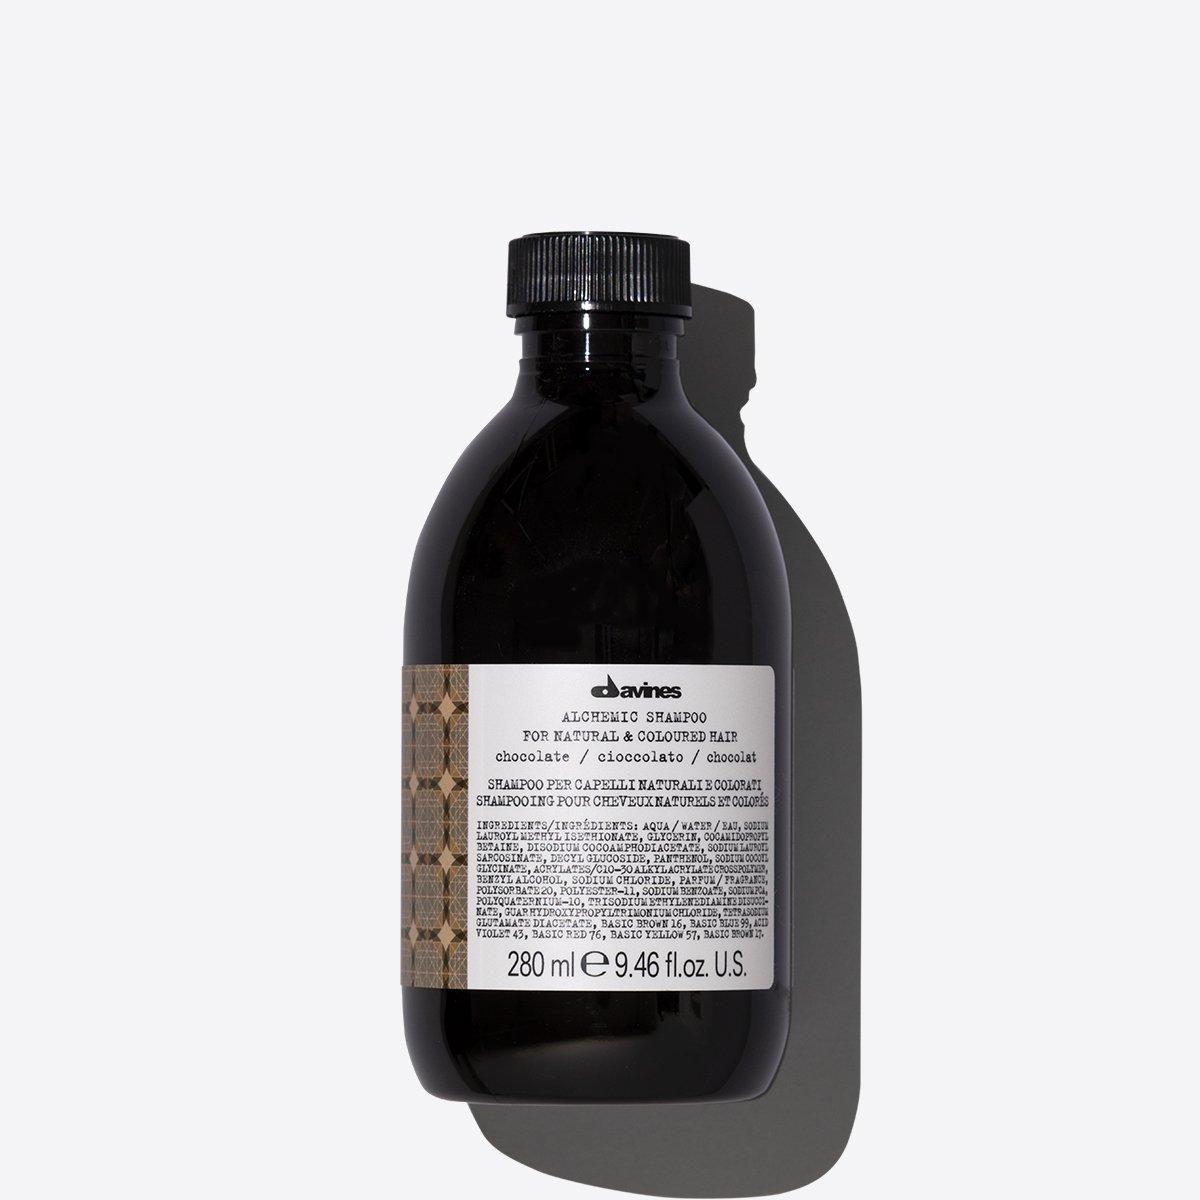 ALCHEMIC SHAMPOO - CHOCOLATE   280ml